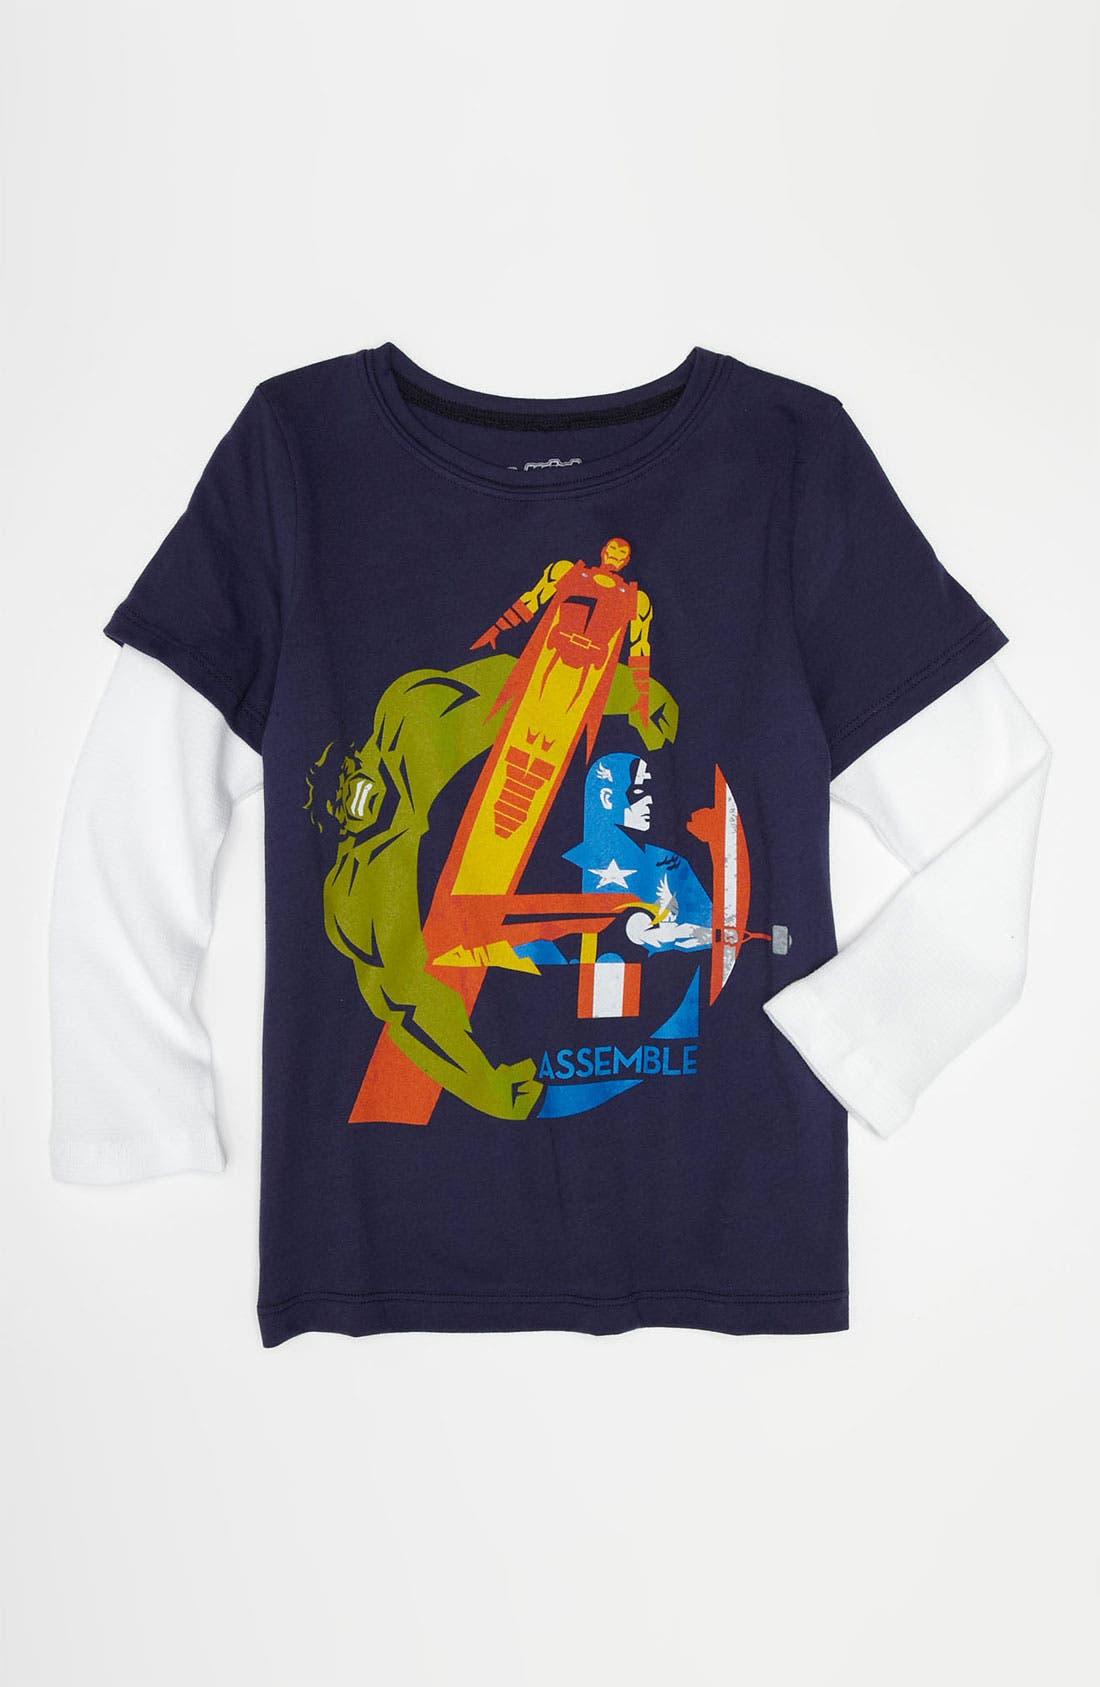 Main Image - Mighty Fine 'Assemble' T-Shirt (Little Boys)